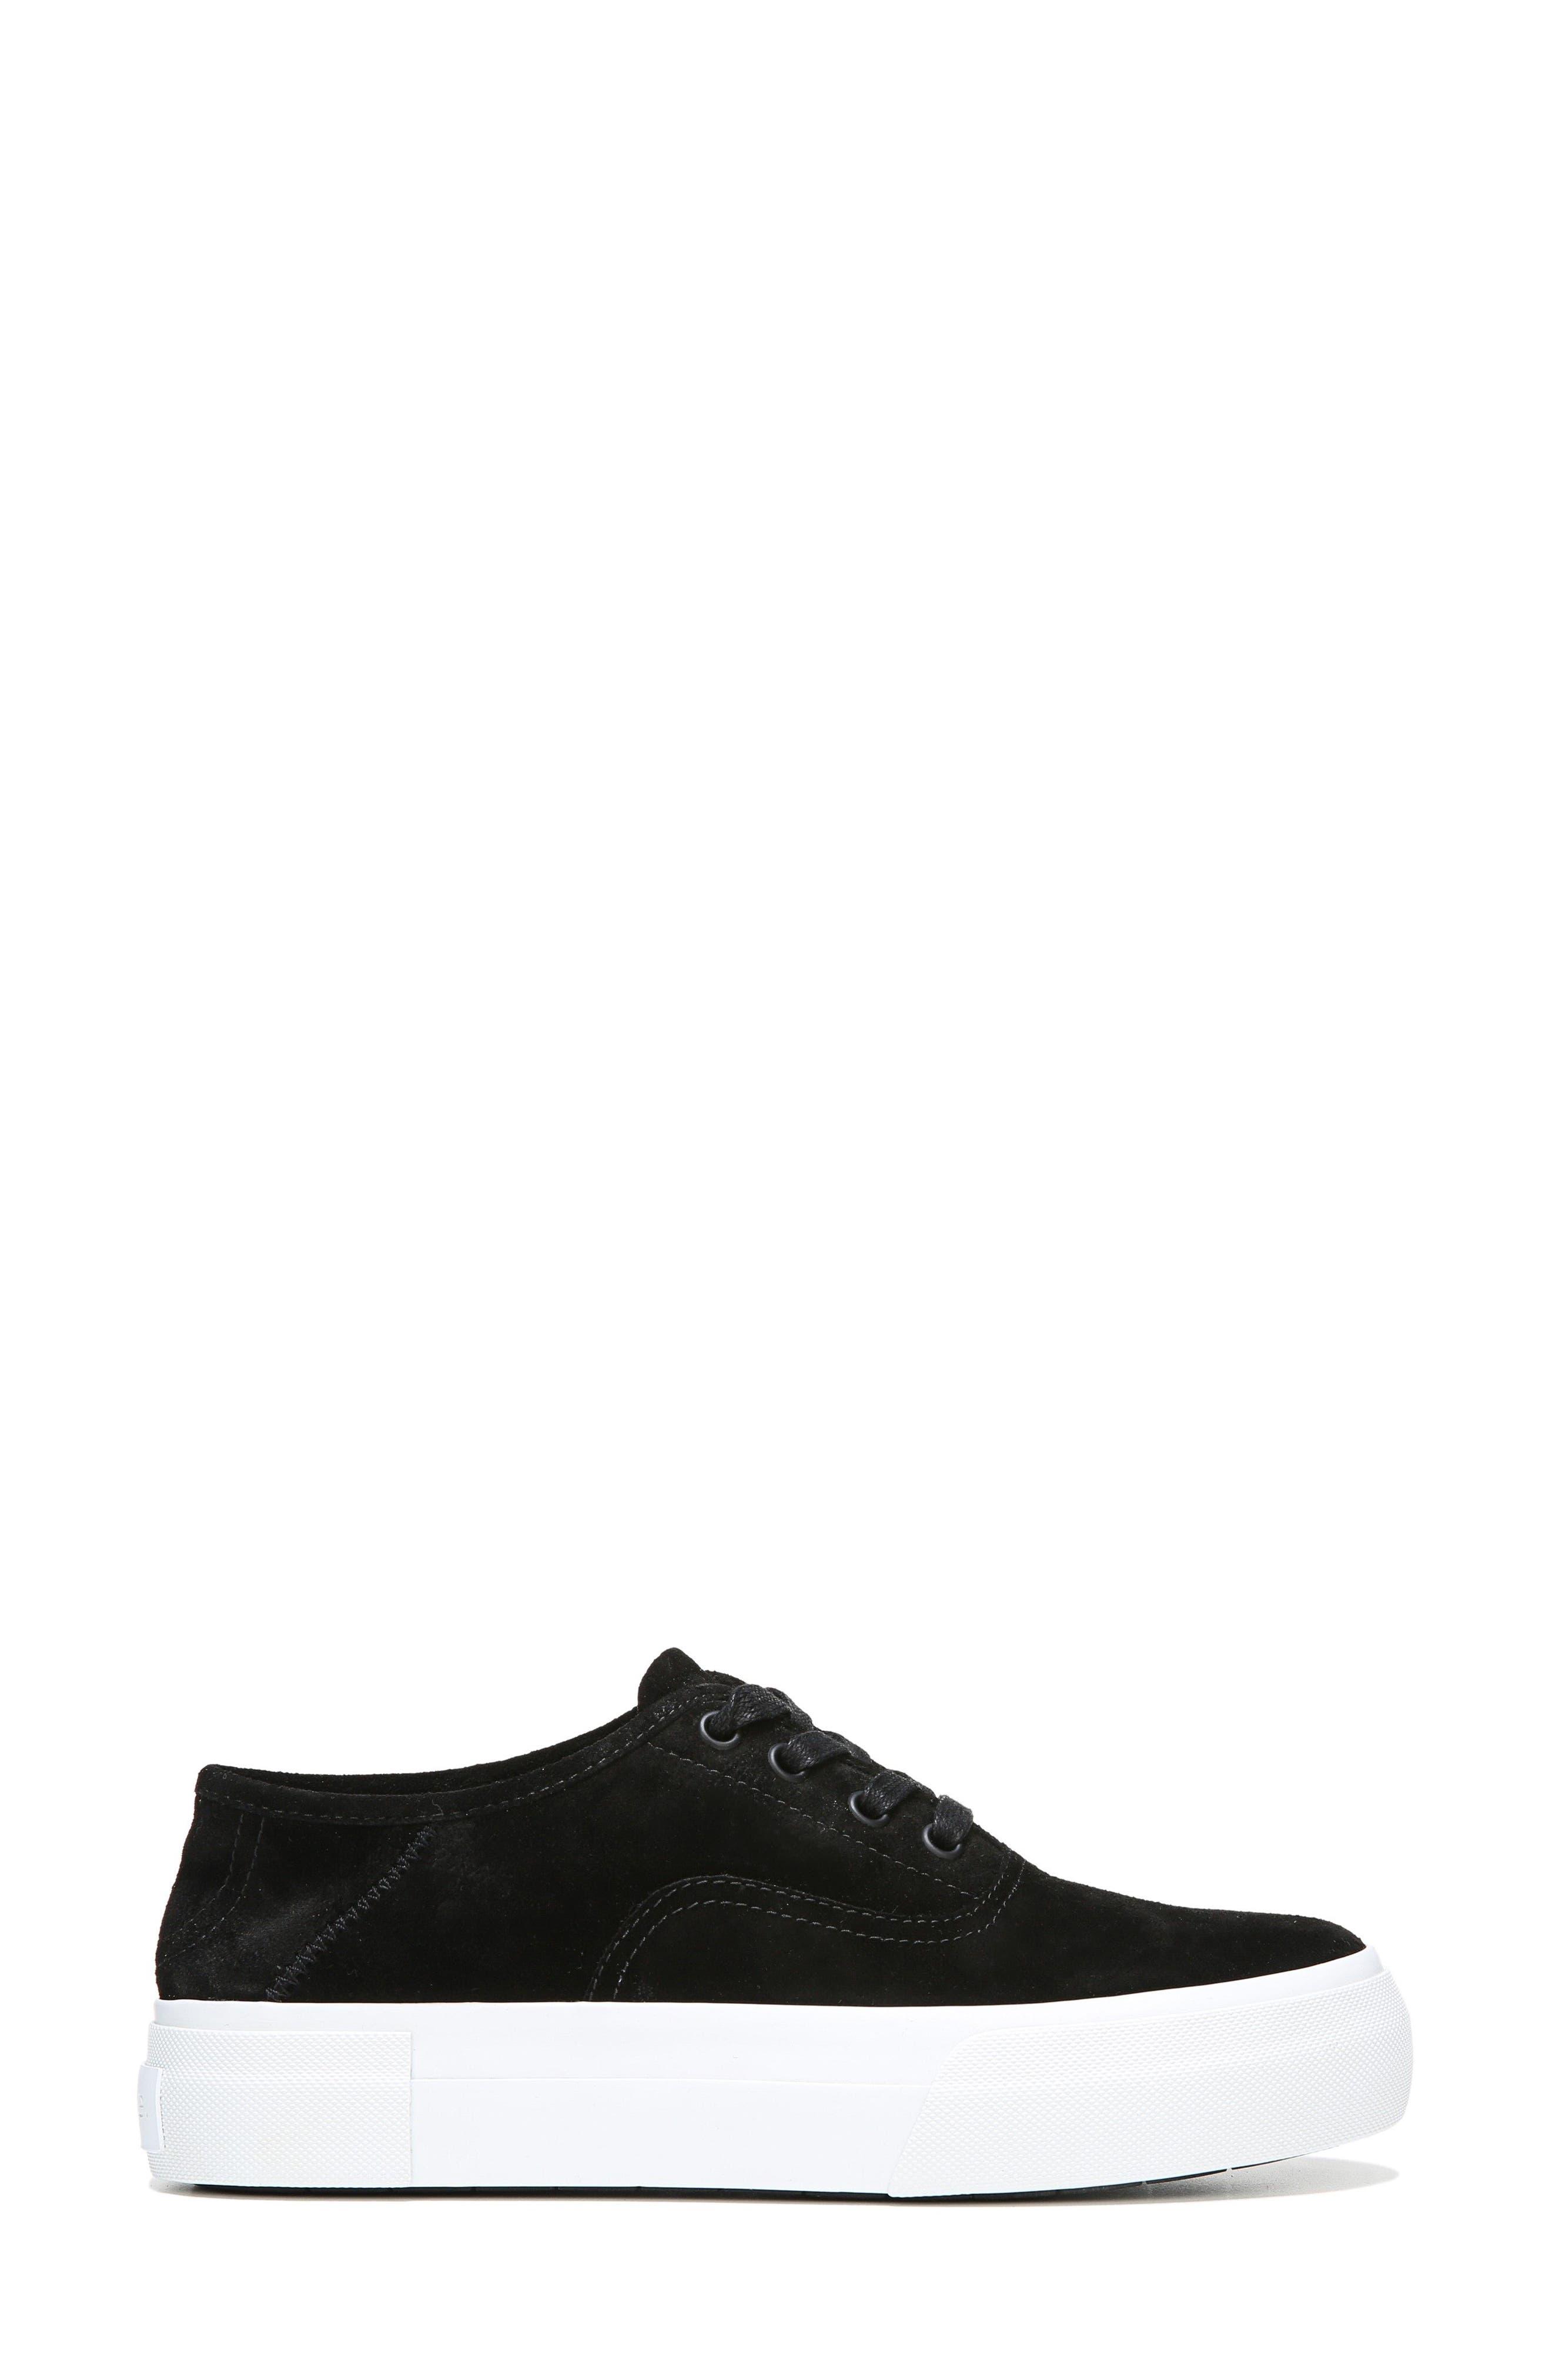 Copley Platform Sneaker,                             Alternate thumbnail 3, color,                             001